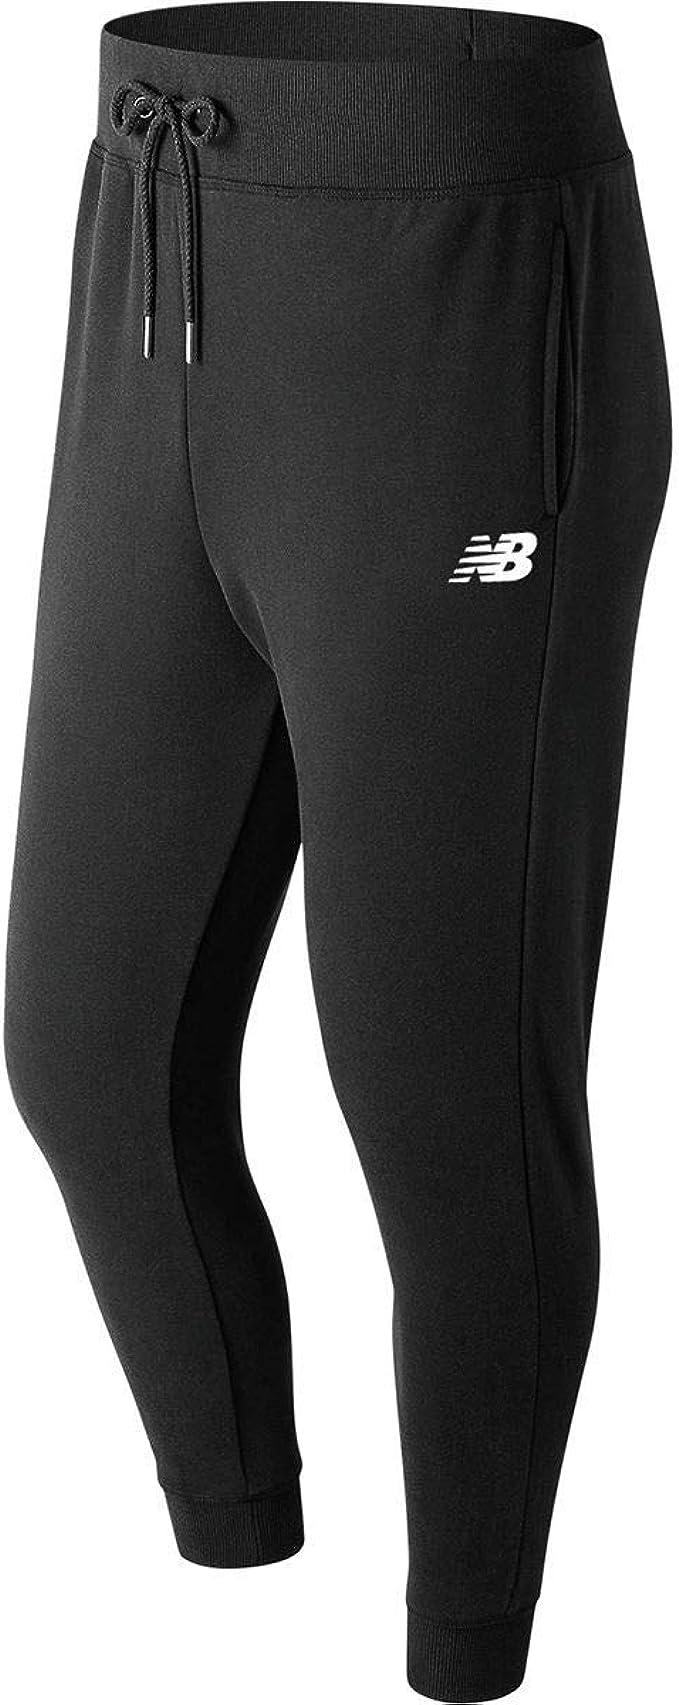 Amazon.com: New Balance 247 Sport Jogger - Men's Black, XL ...